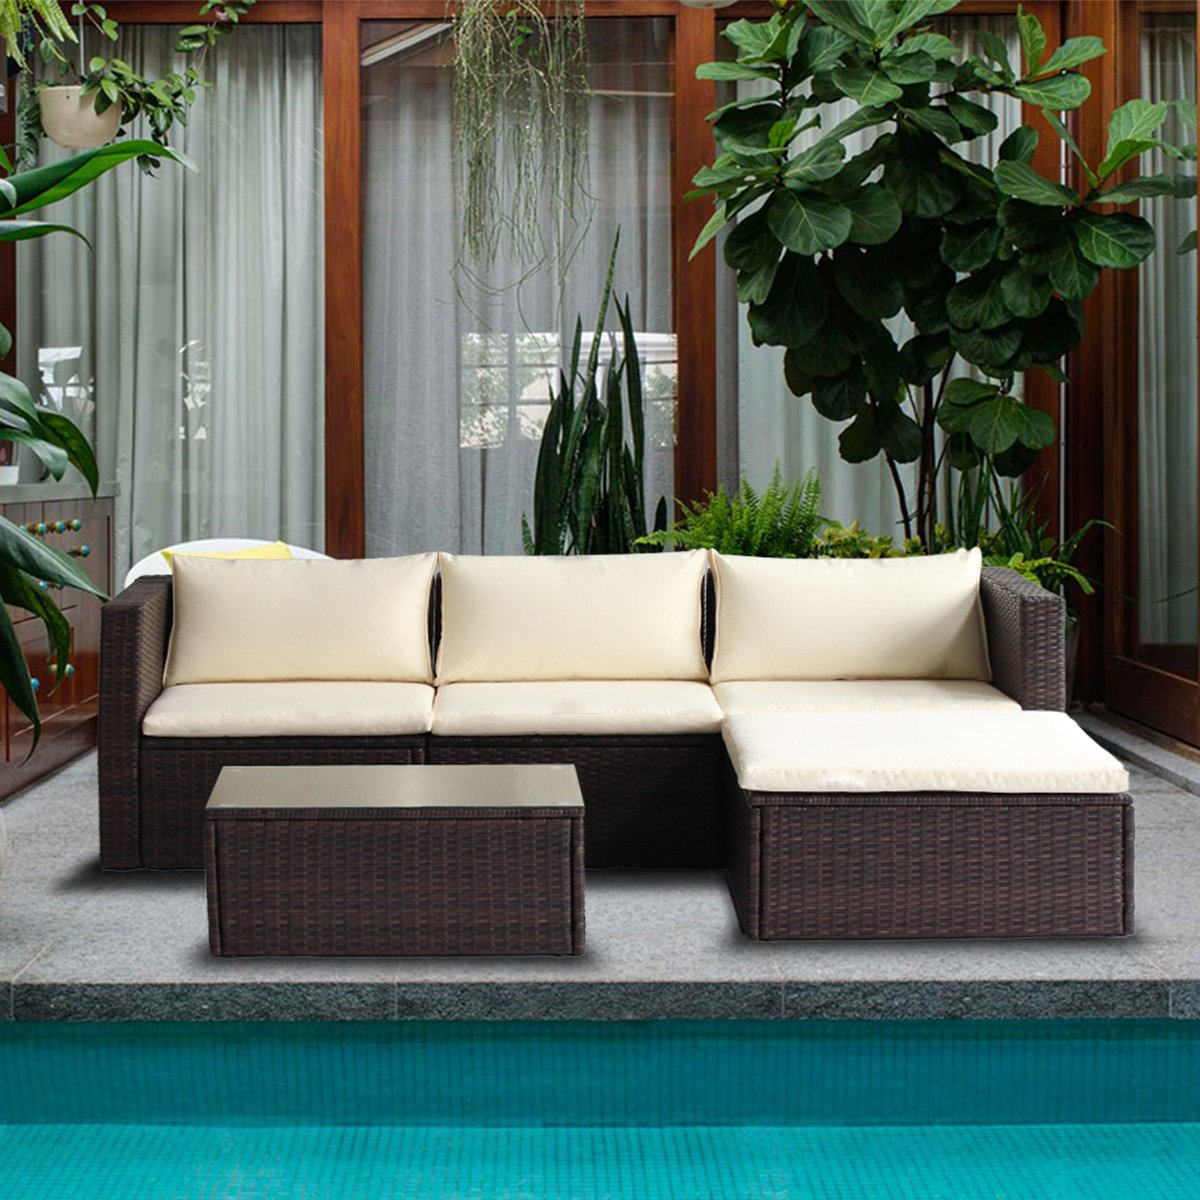 Merax 5-Piece Cushioned Outdoor Patio PE Rattan Furniture Set Sectional Garden Sofa (Brown.) by Merax